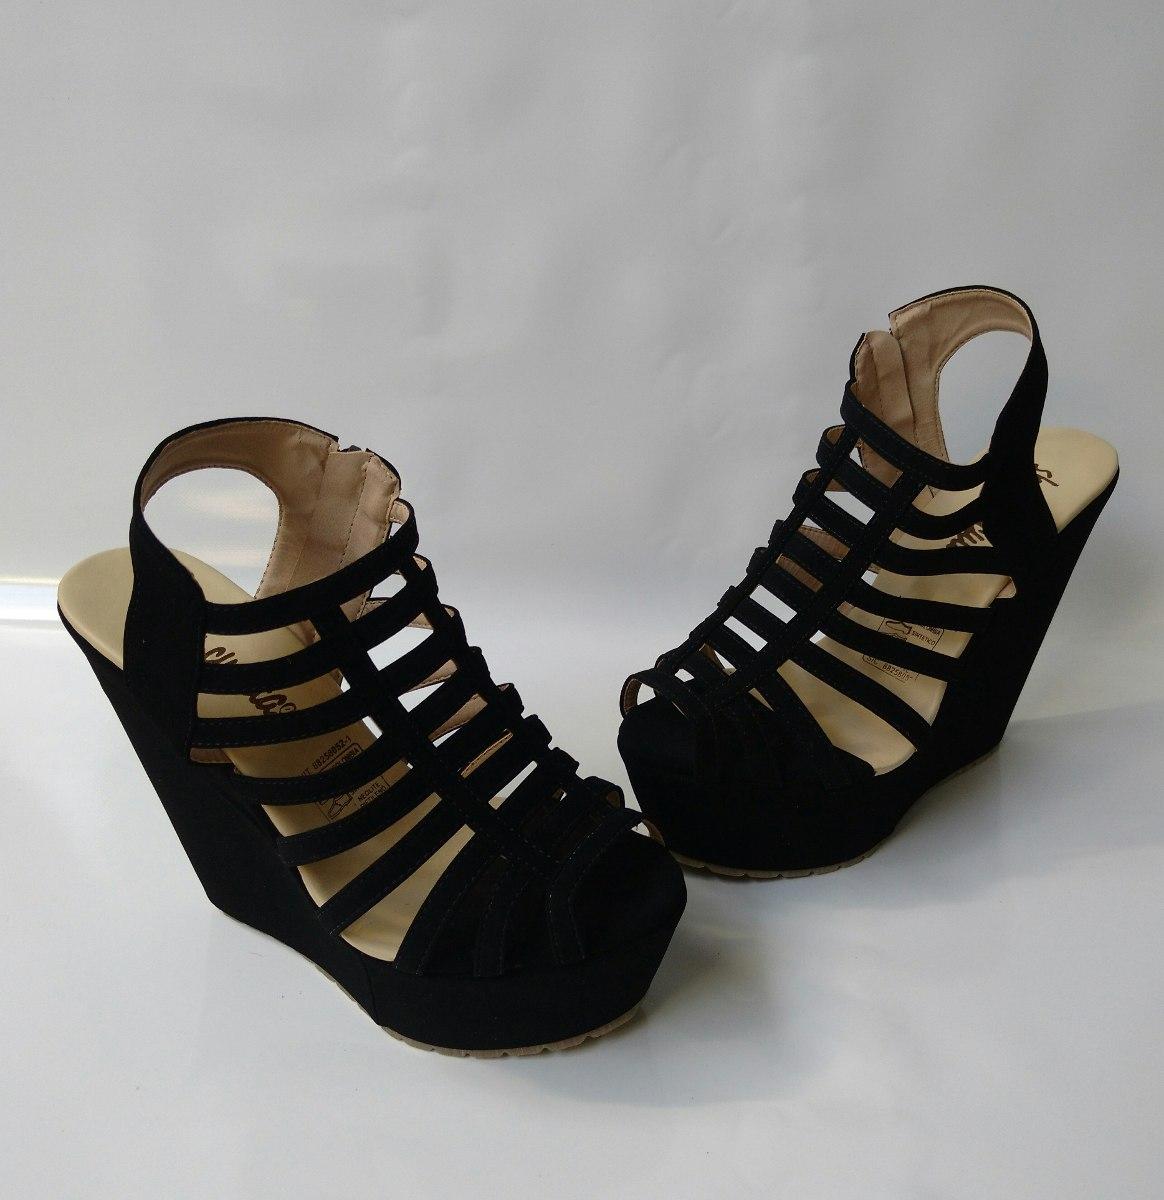 the latest 1ae0c c8891 zapatos-negros-mujer -tacon-corrido-plataforma-envio-gratis-D NQ NP 629115-MCO25168566632 112016- F.jpg